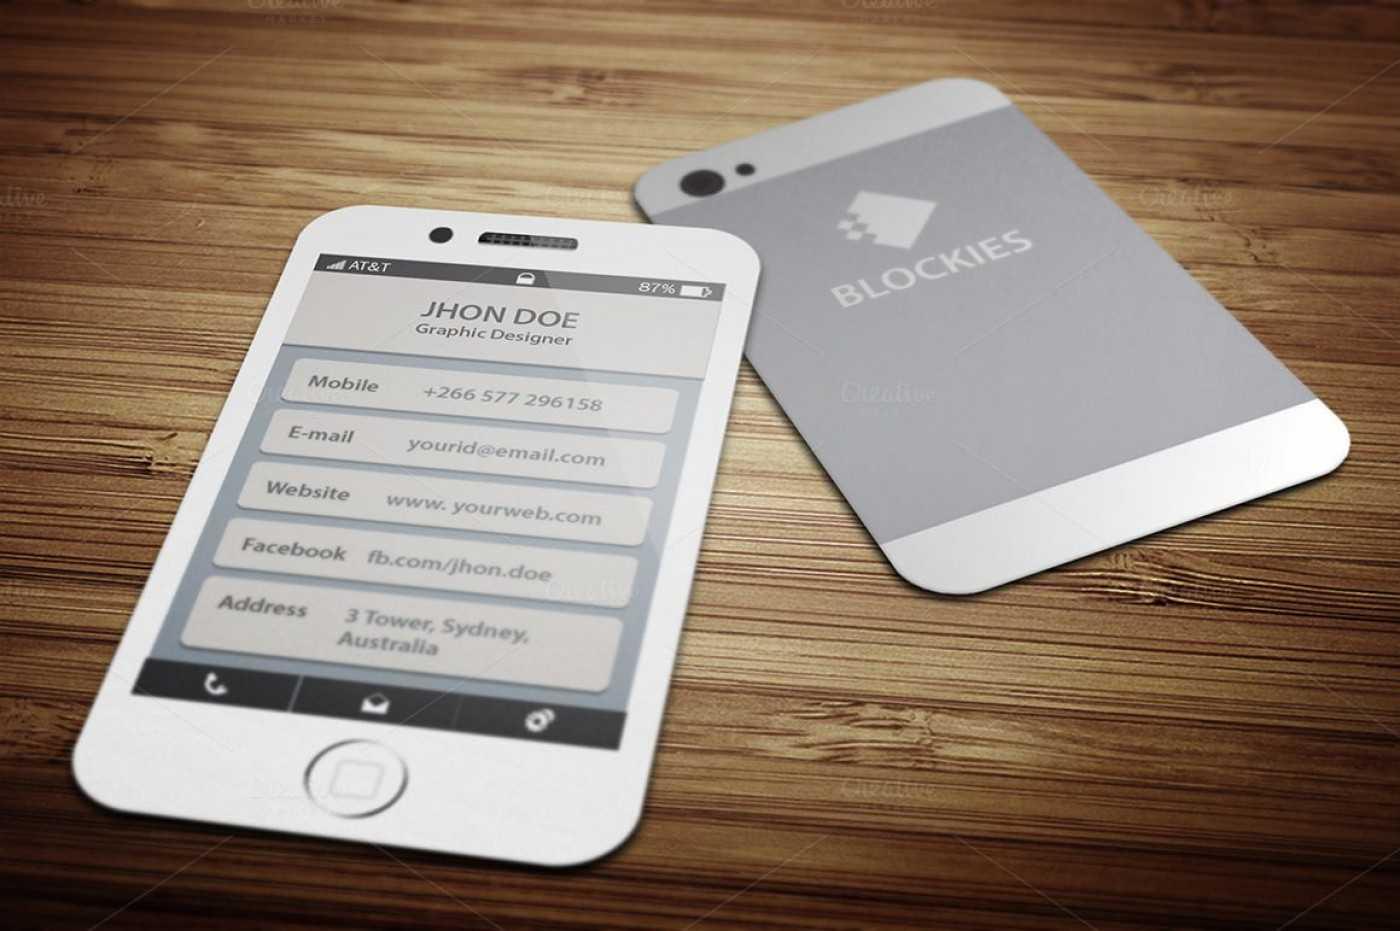 005 Template Ideas Iphone Business Unusual Card Free Psd Regarding Iphone Business Card Template